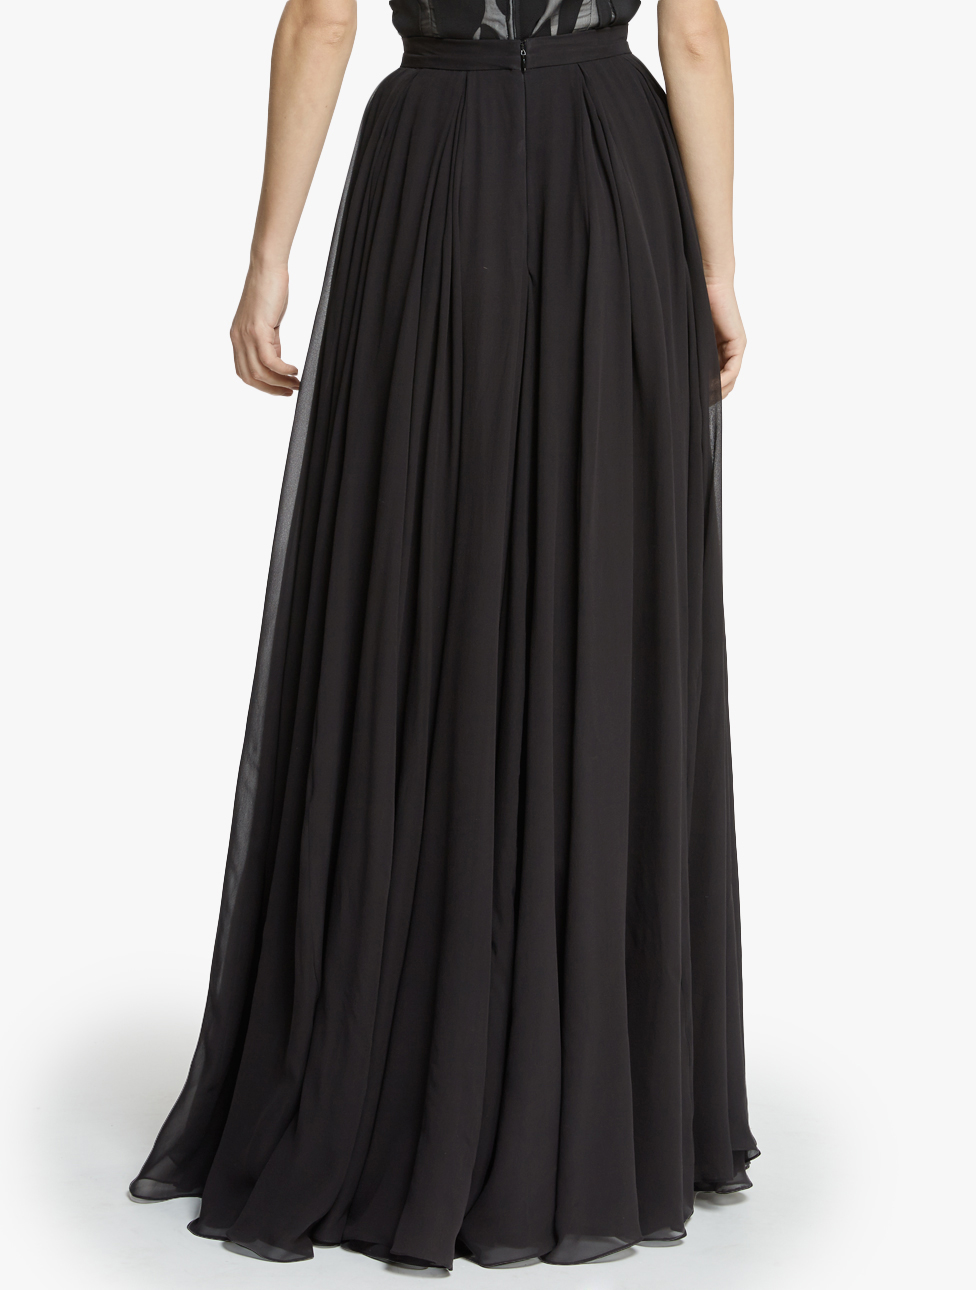 Halston Flowy Georgette Maxi Skirt in Black | Lyst